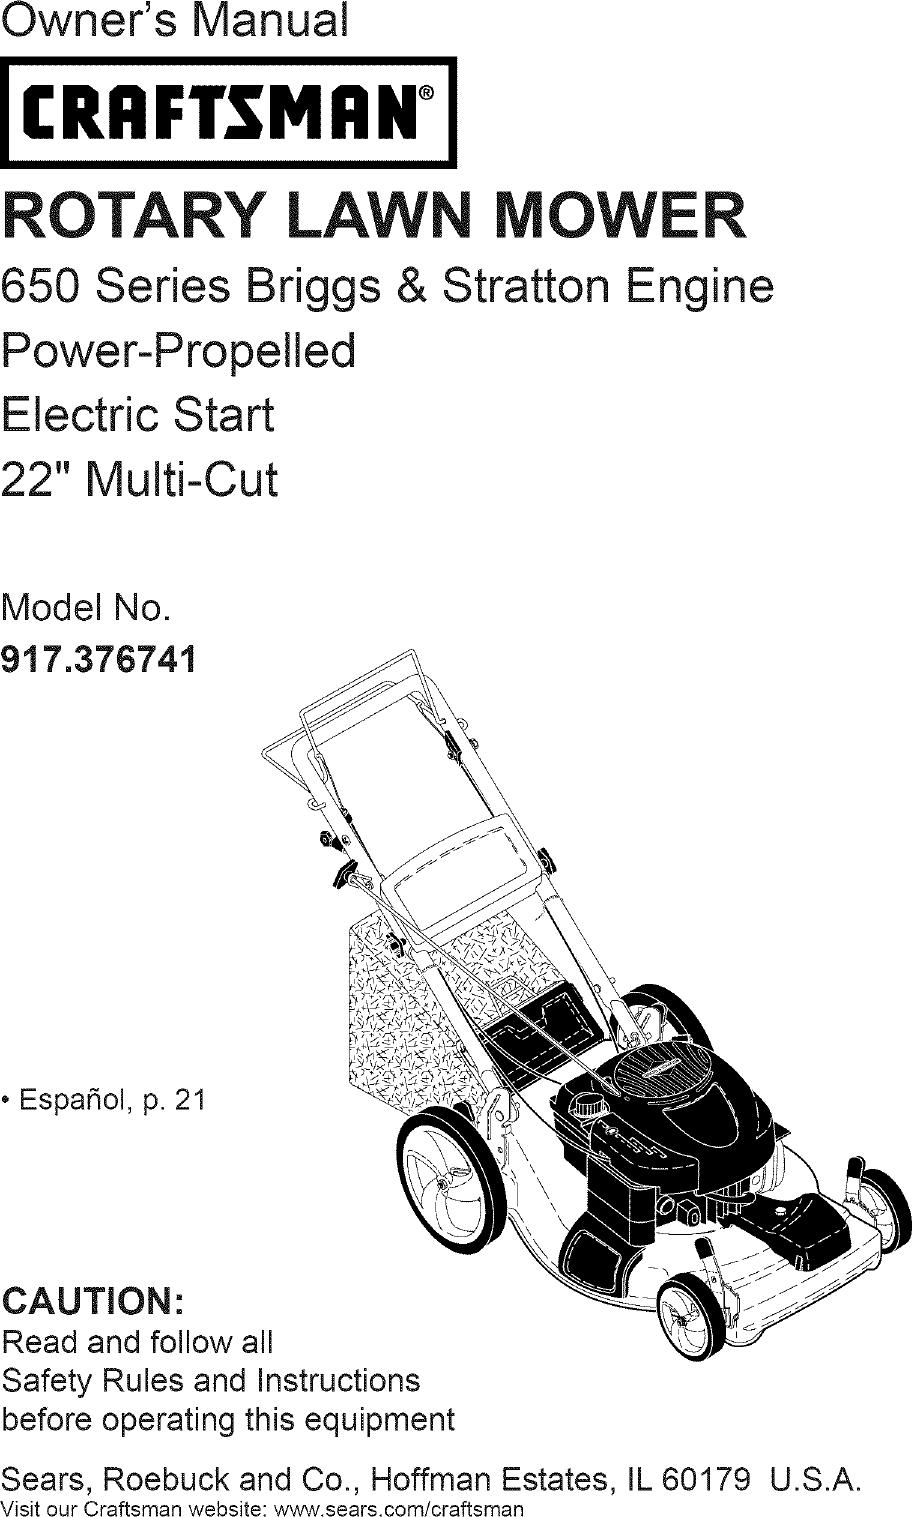 Craftsman 917376741 User Manual LAWN MOWER Manuals And